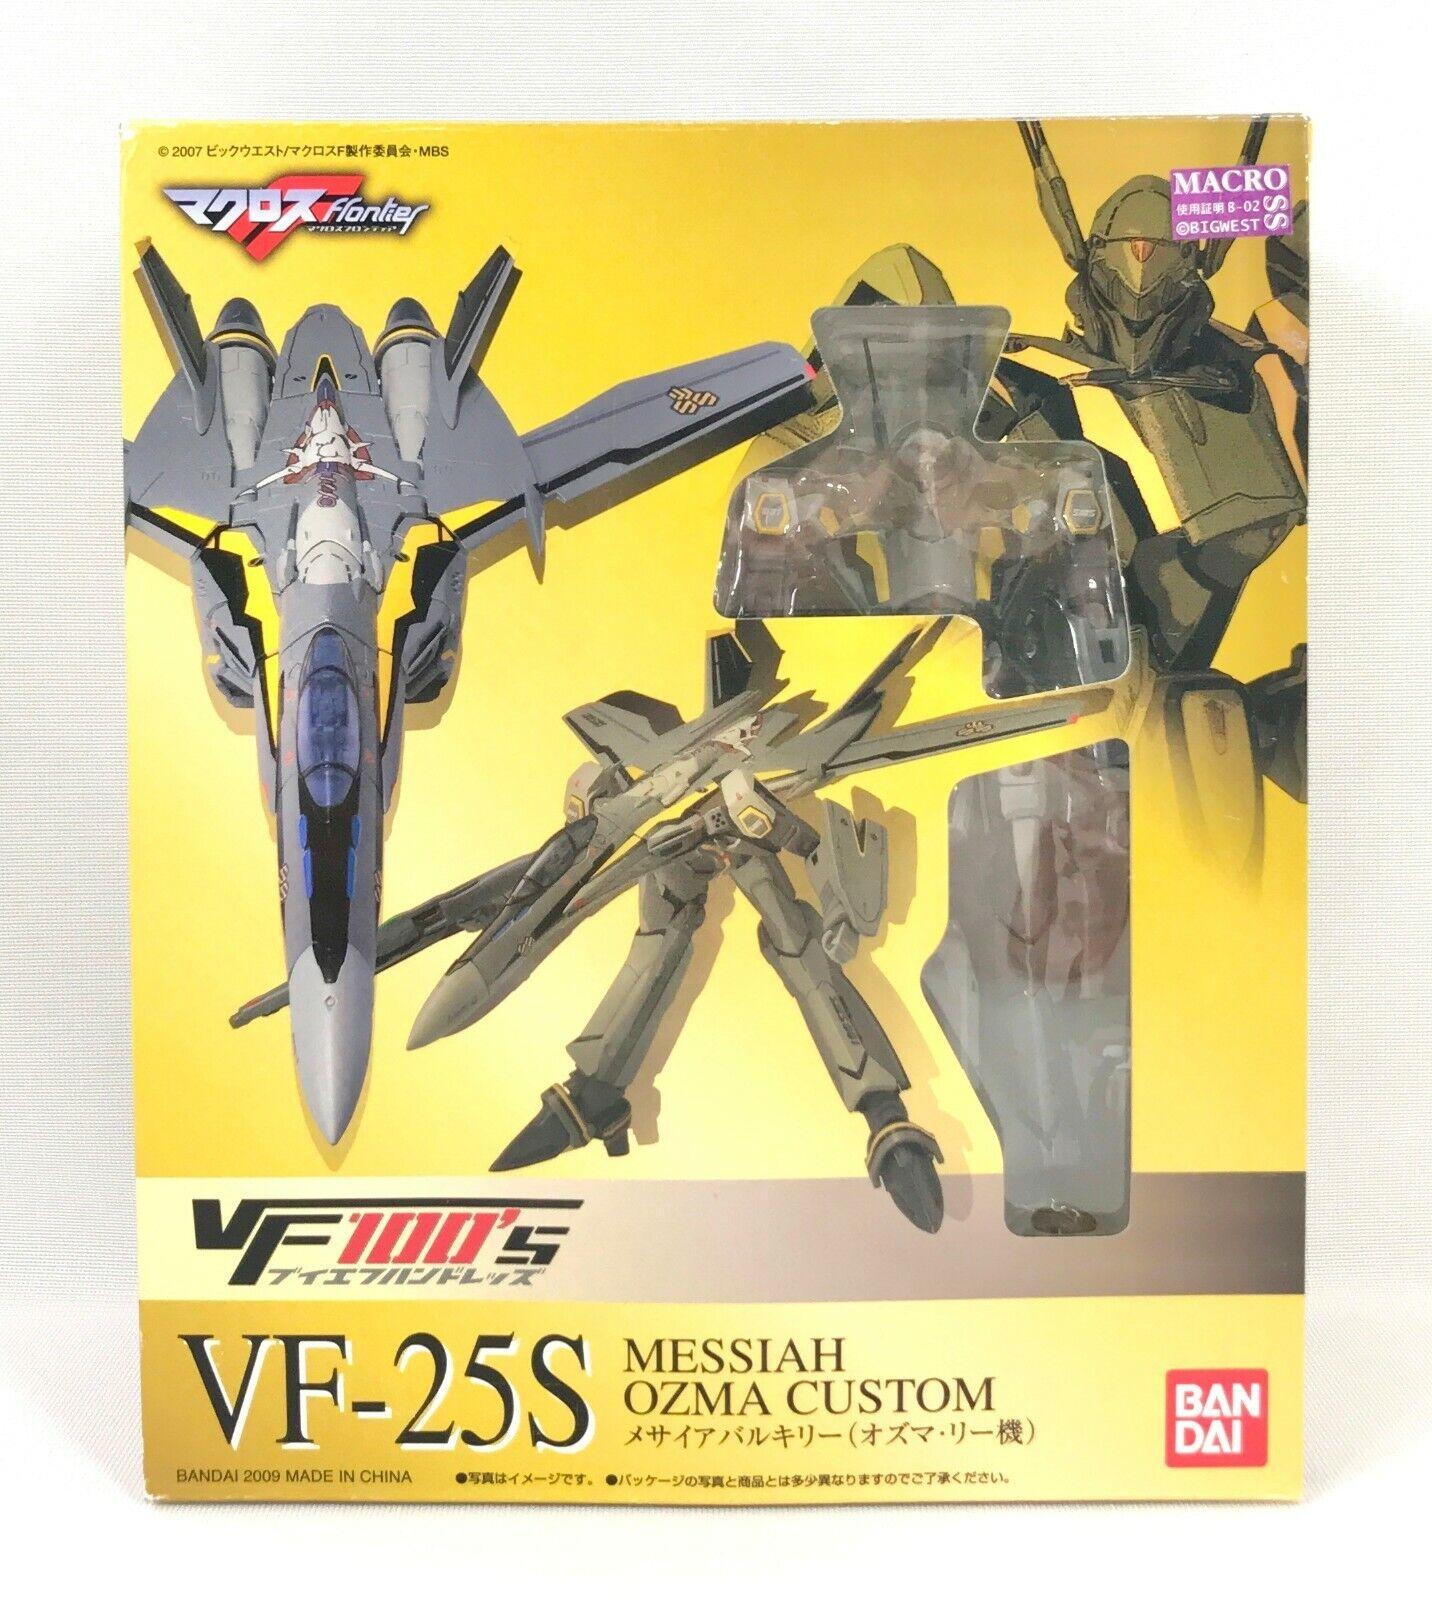 Ozma Custom Bandai Macross Frontier 1//72 VF-25S Messiah Valkyrie Plastic Model